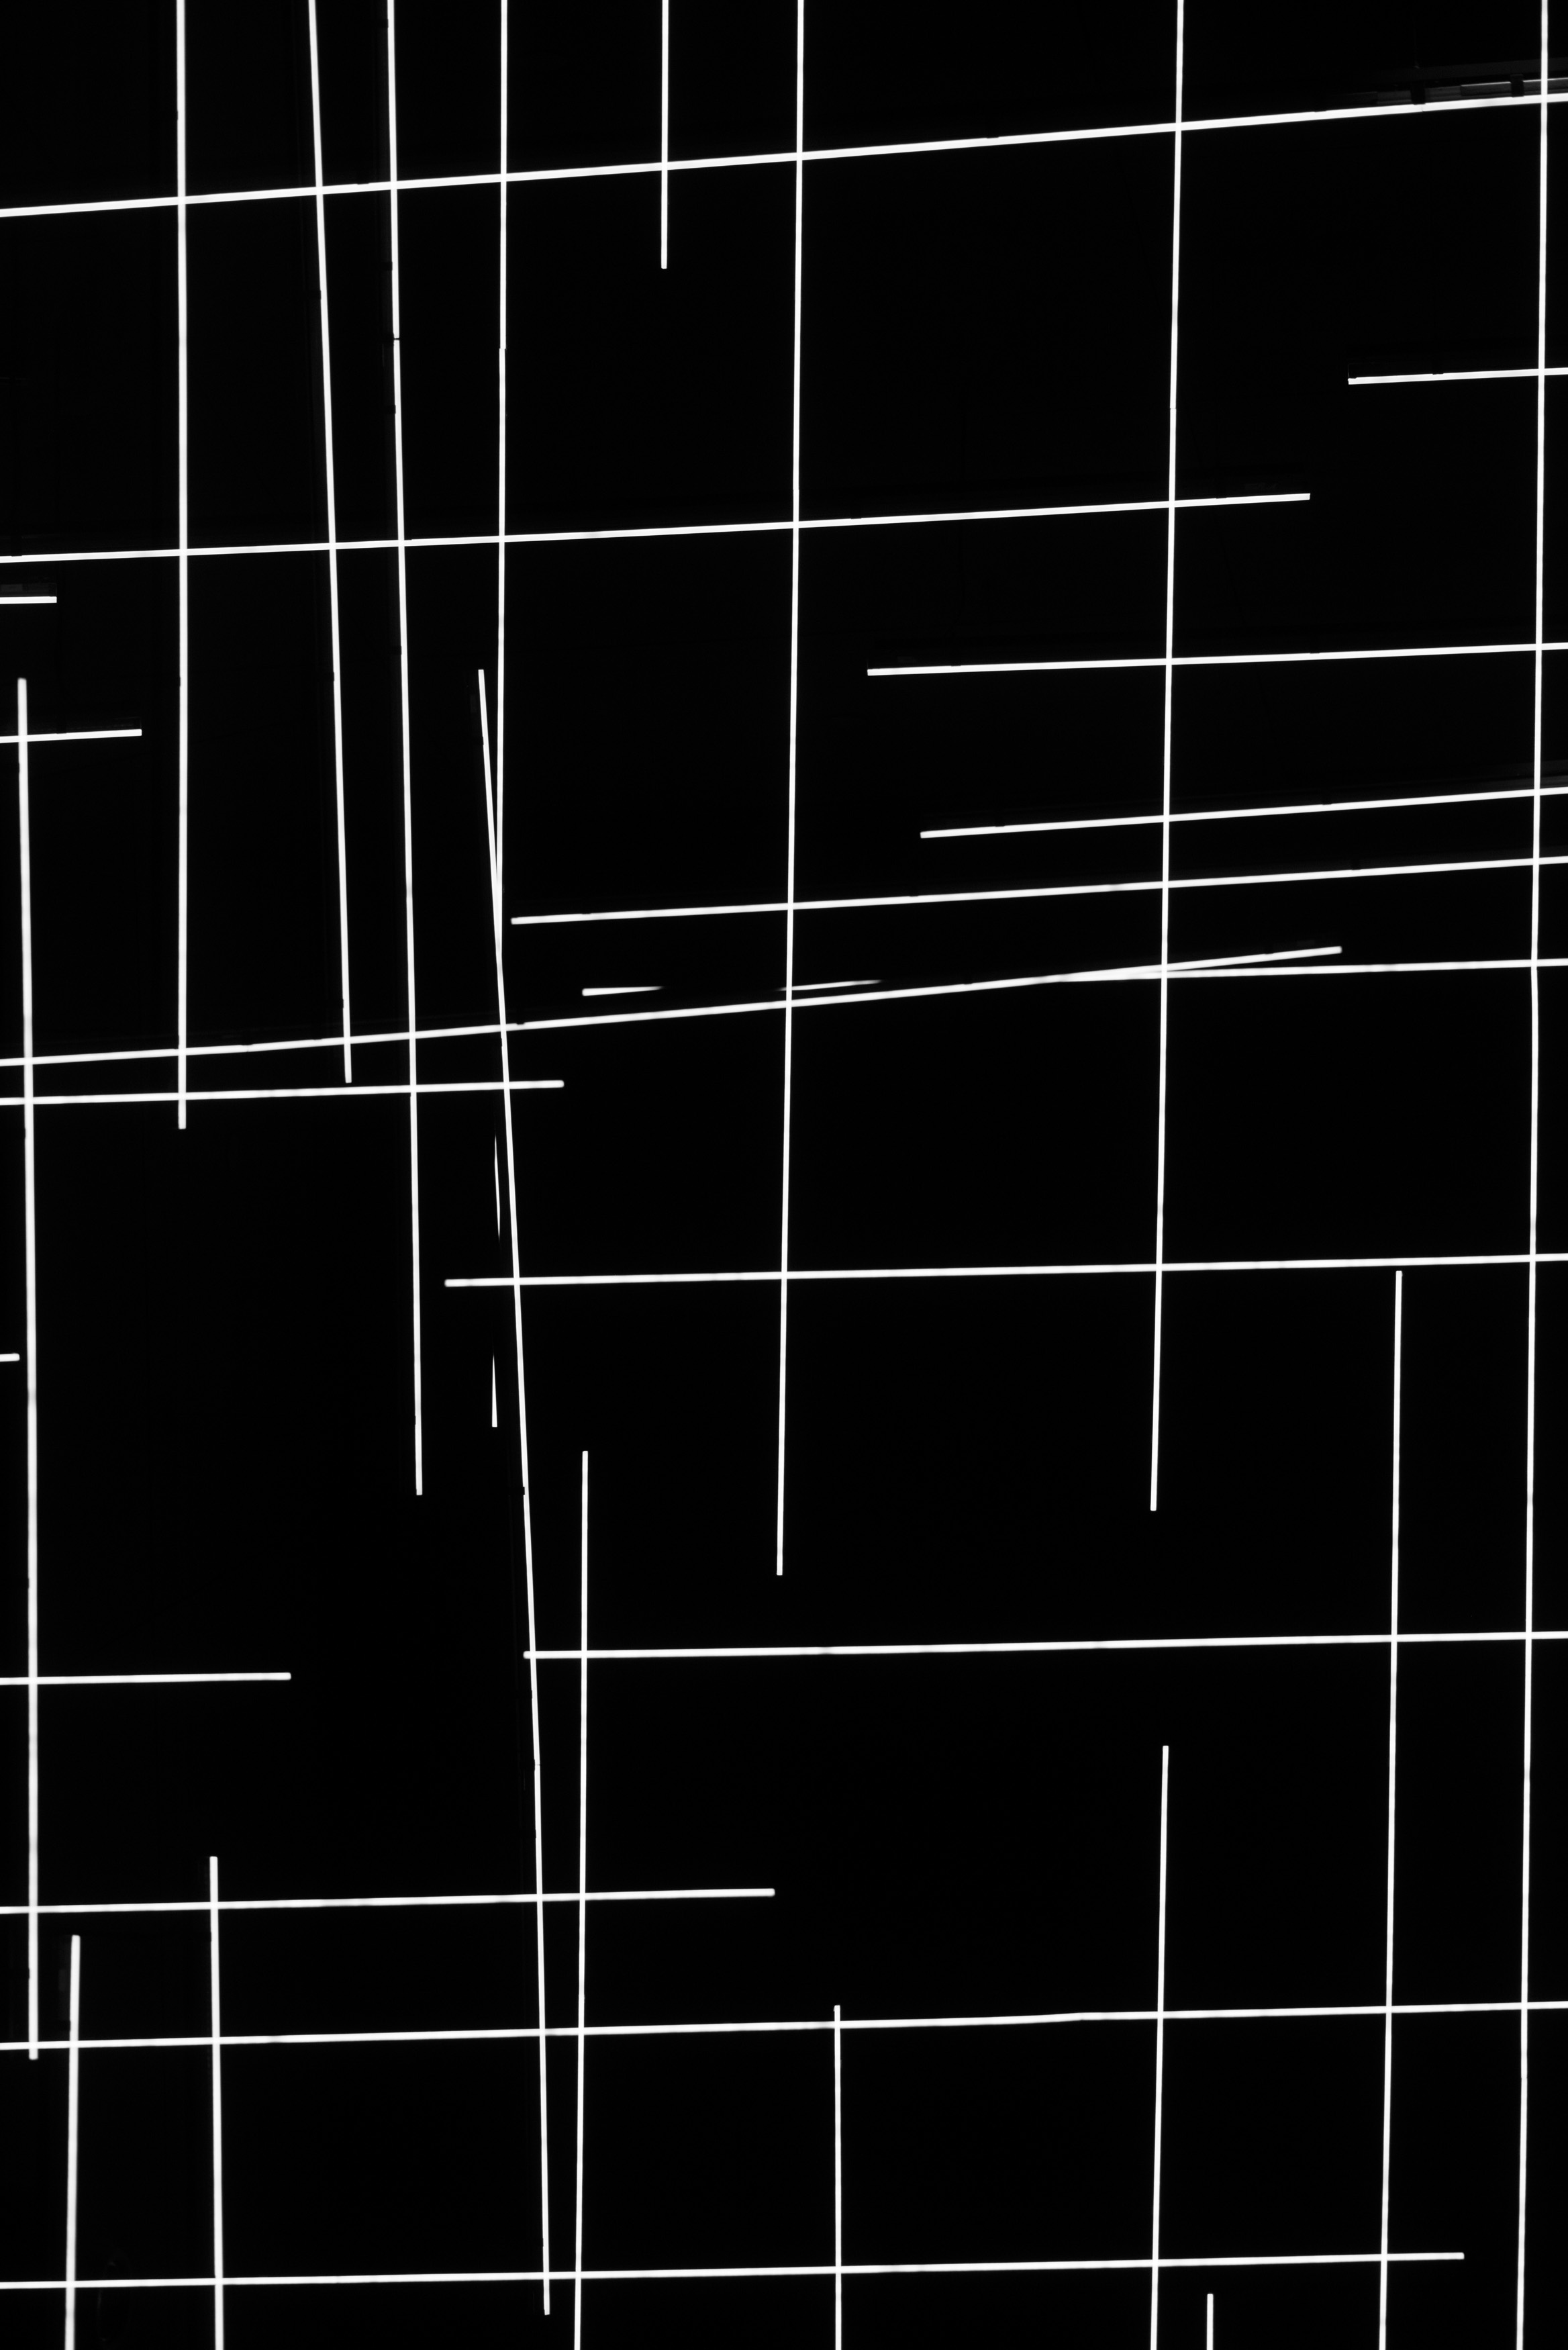 Rhythm Study I, 2013 Archival pigment print 30x20 inches